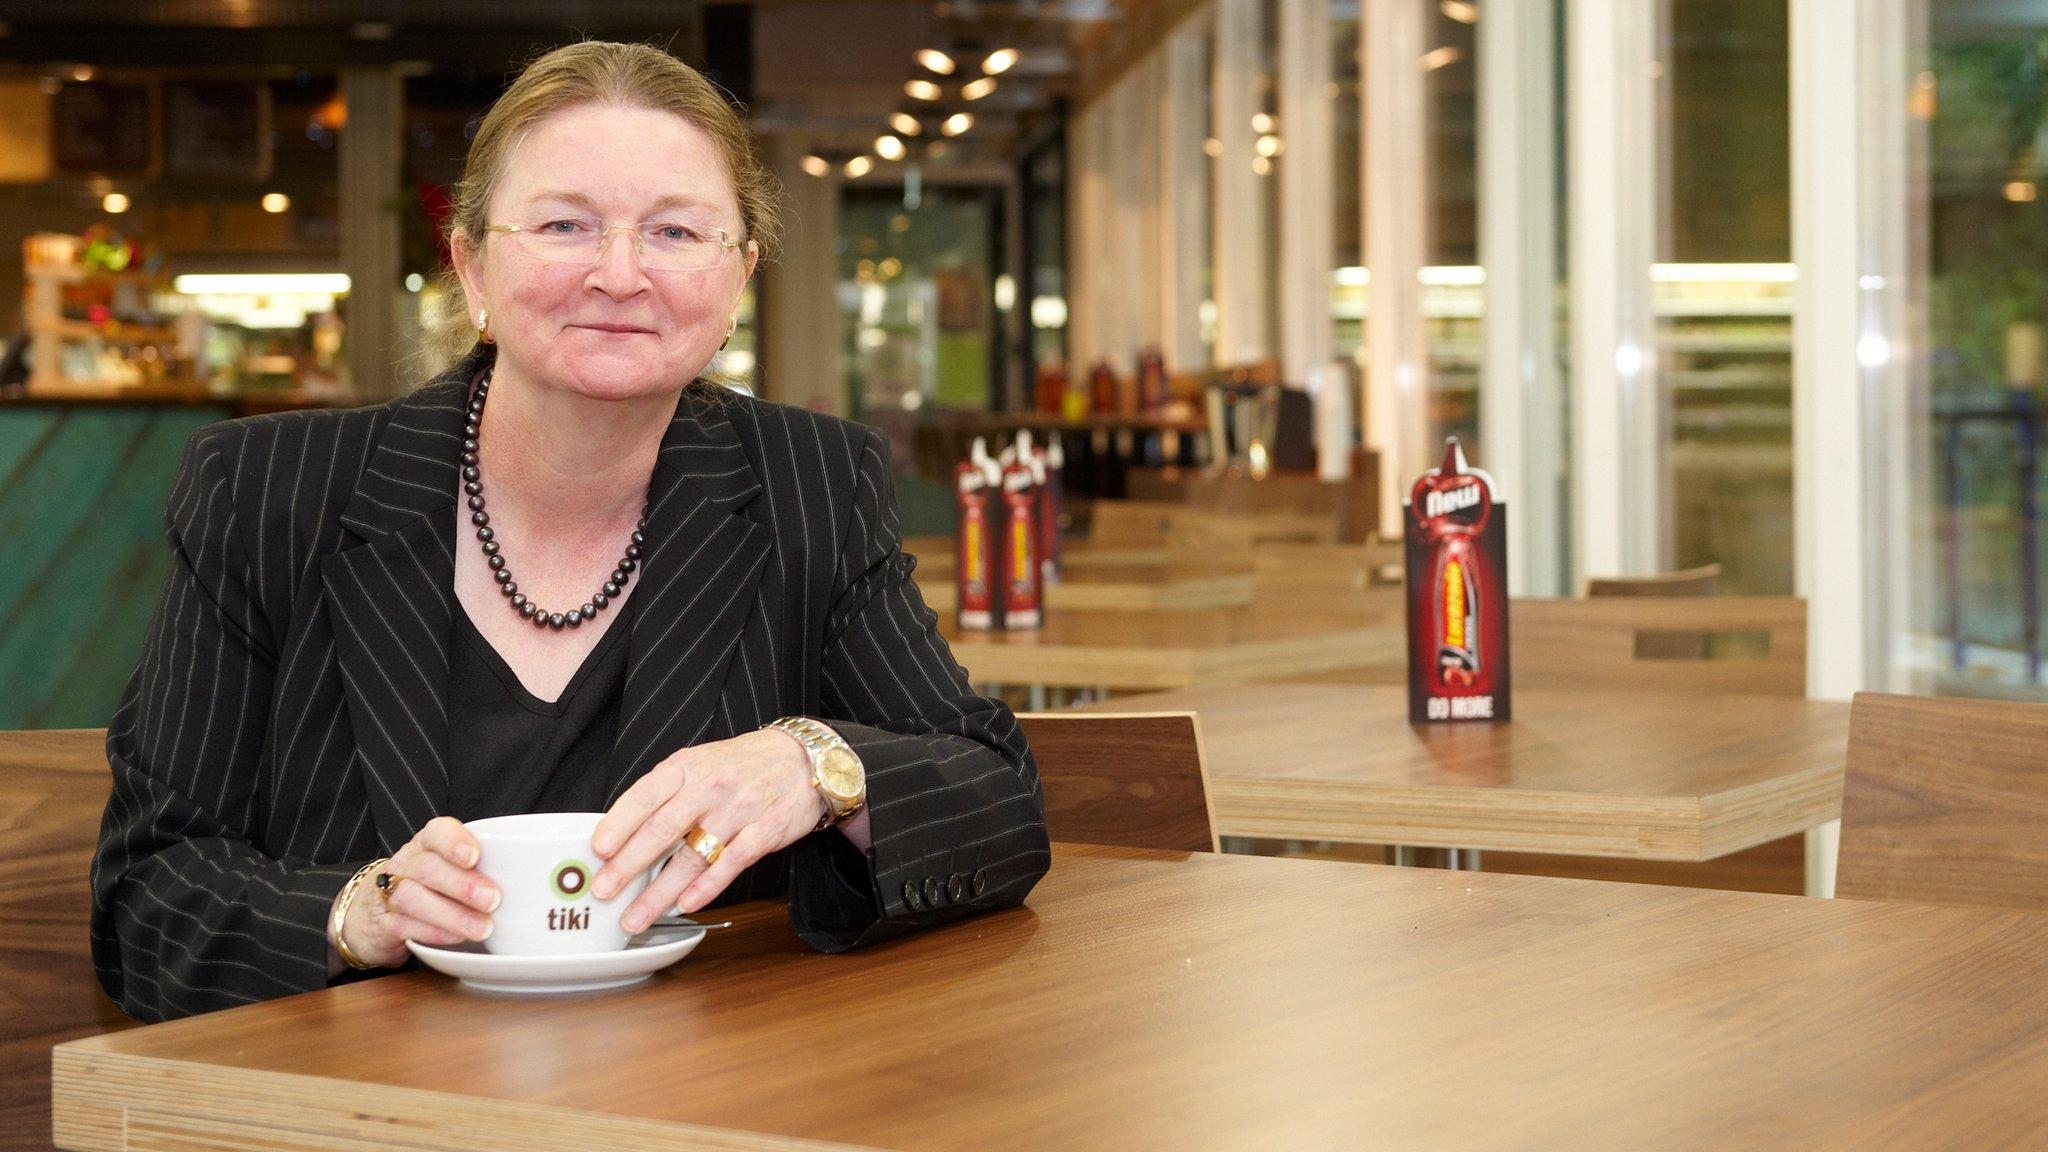 Bath University vice-chancellor wins no confidence vote